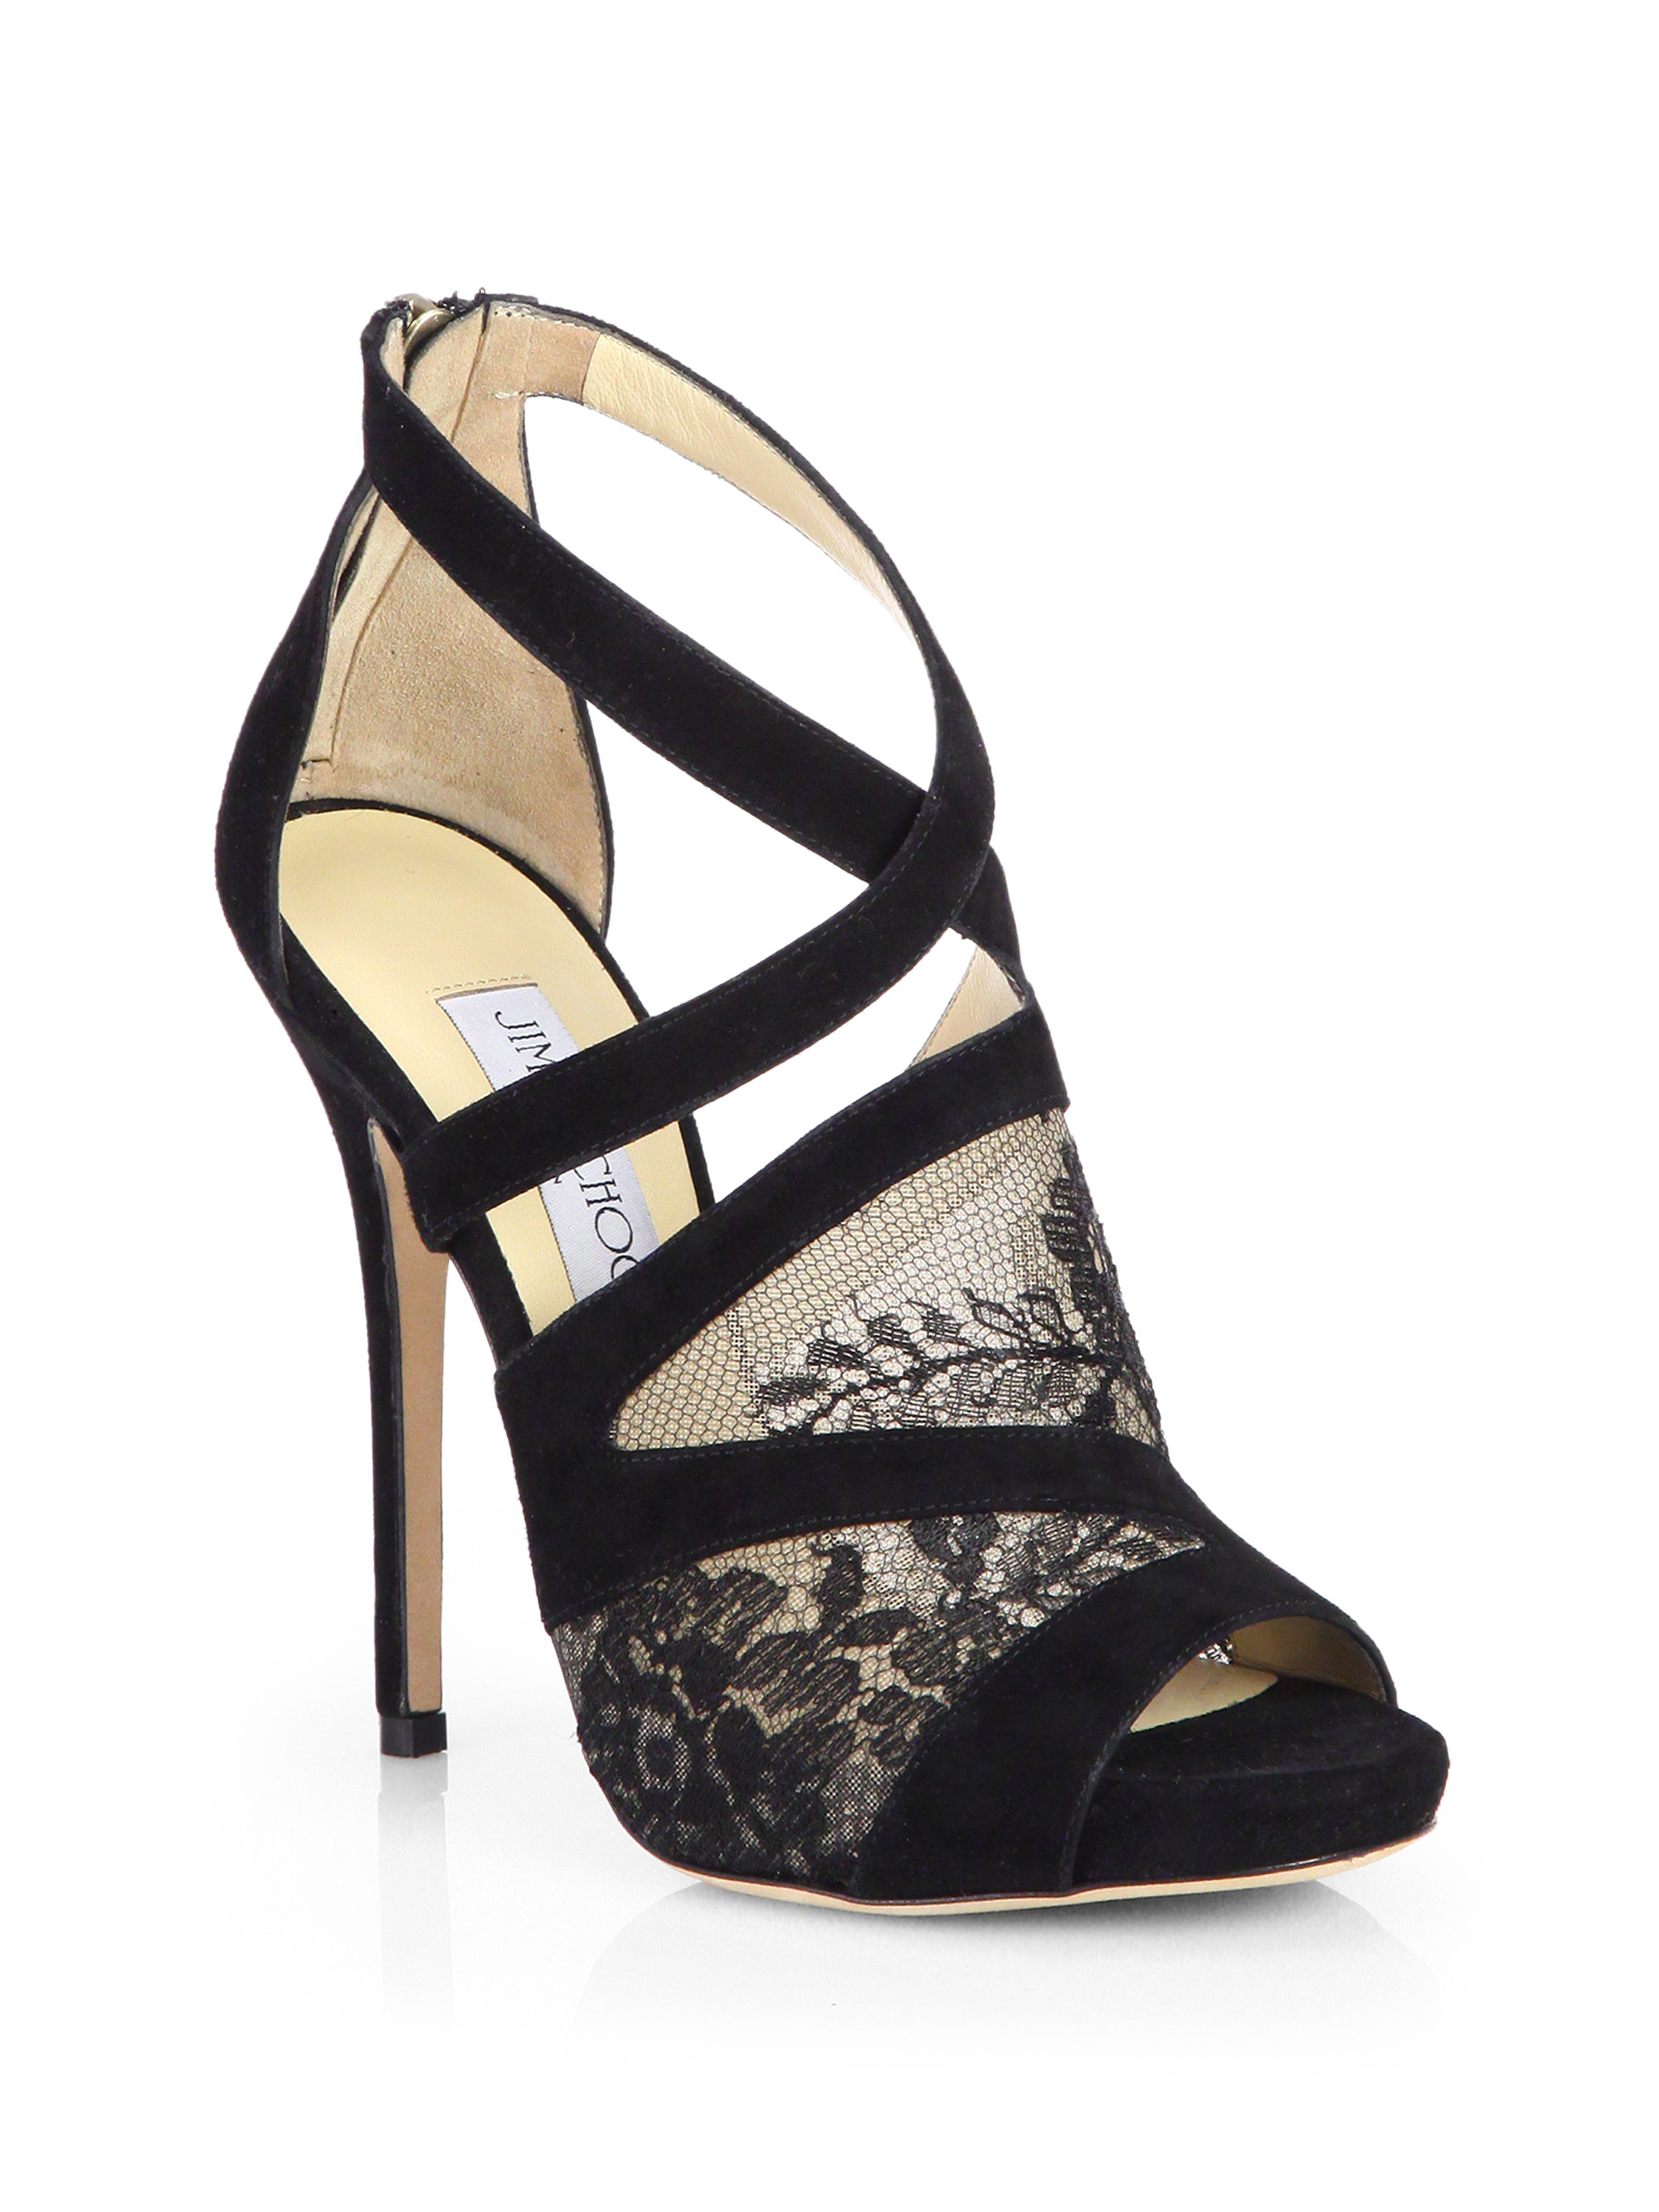 Jimmy Choo Vantage Suede & Lace Platform Sandals in Black ...